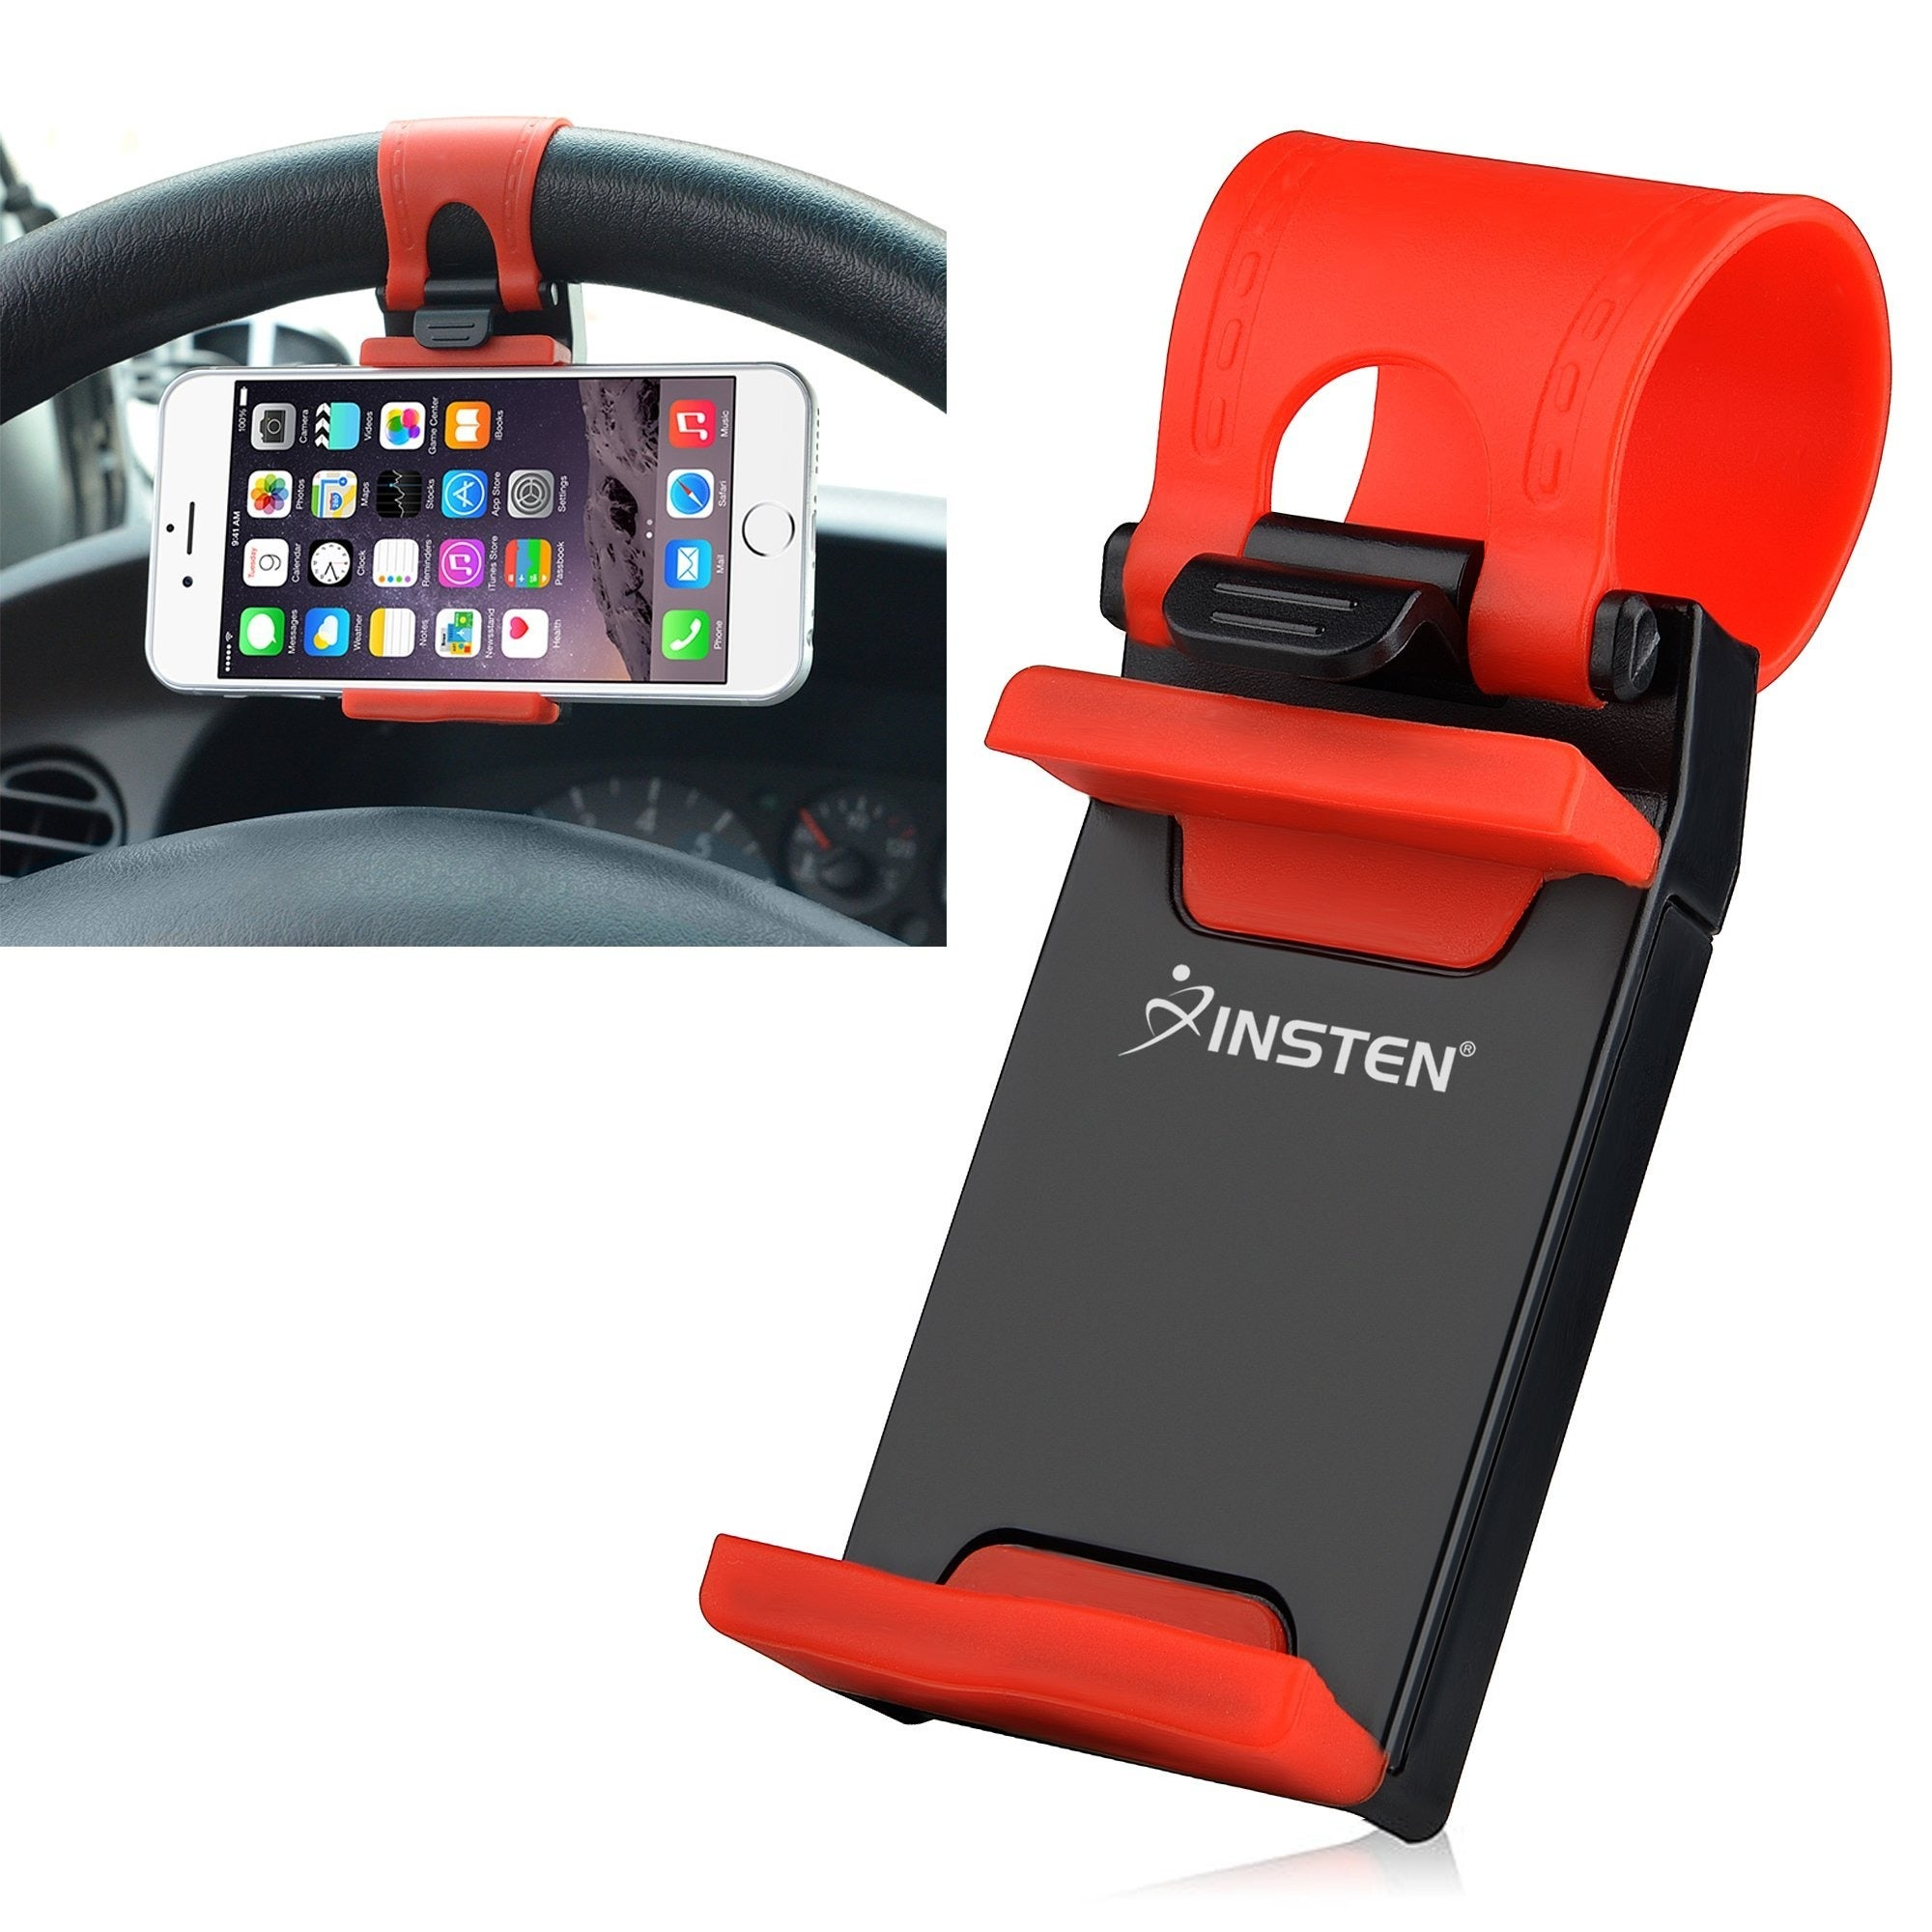 Insten Universal Car Steering Wheel Clip Mount Phone Hold...